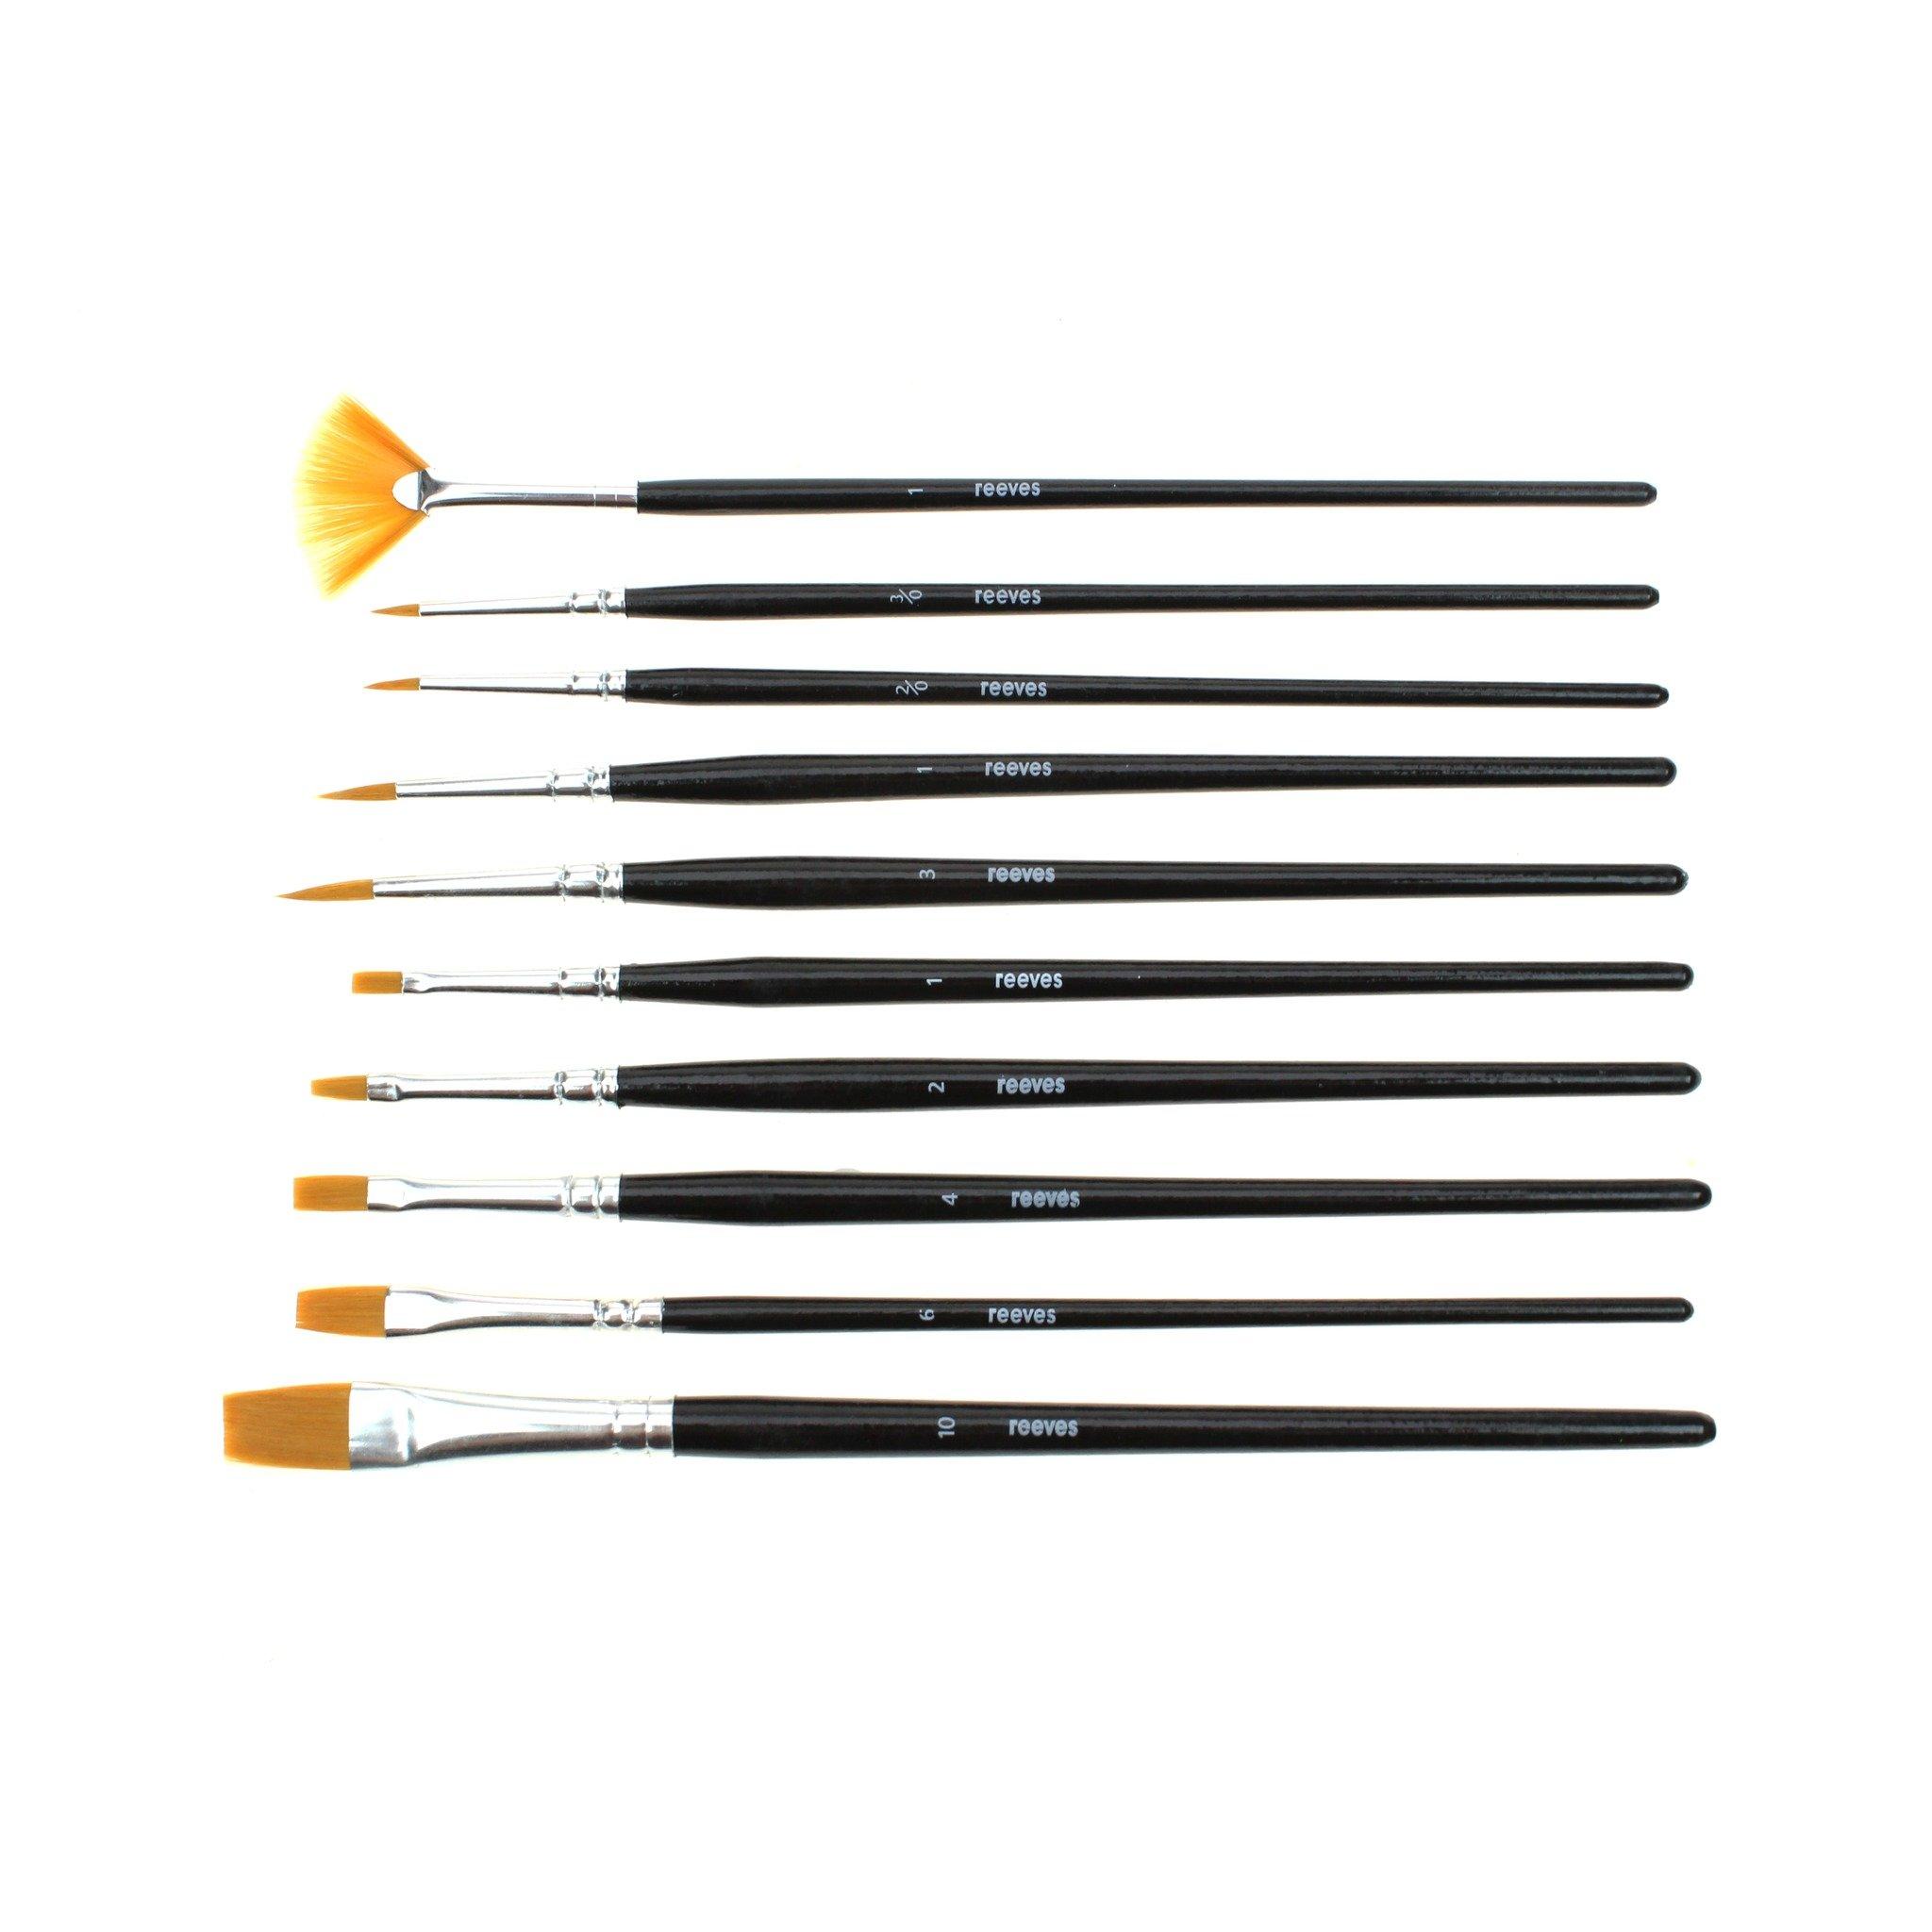 ست قلمو آبرنگ ریوز ۱۰ عددی reeves brushes watercolor